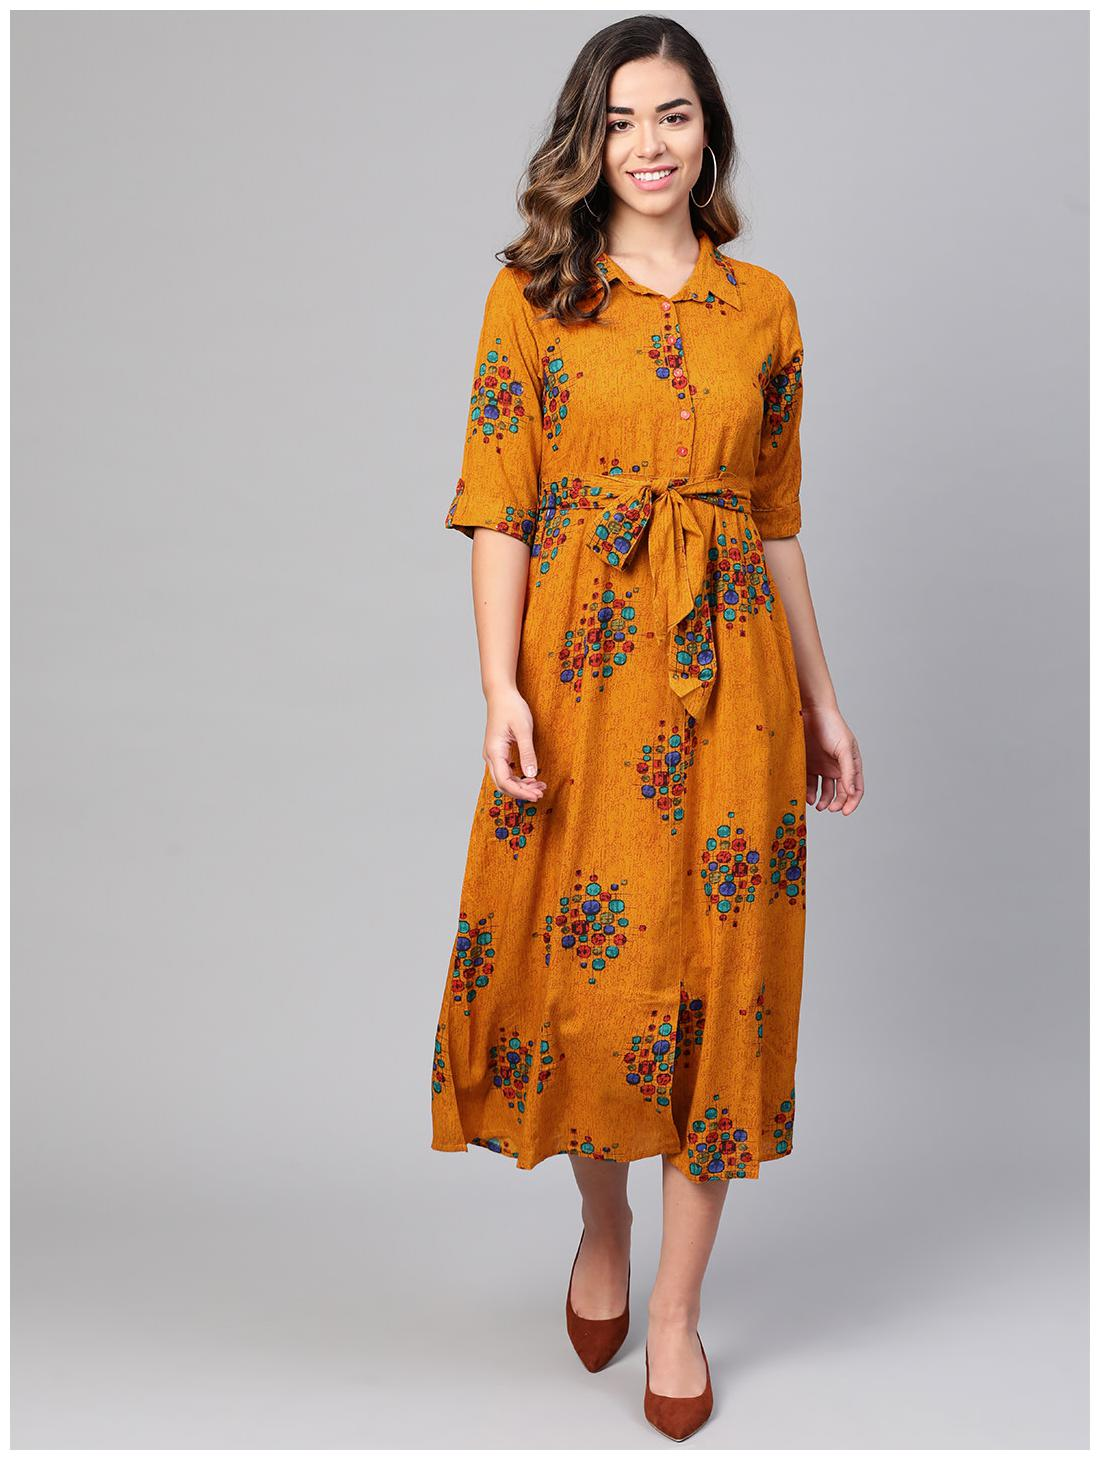 Myshka Yellow Floral Flared dress